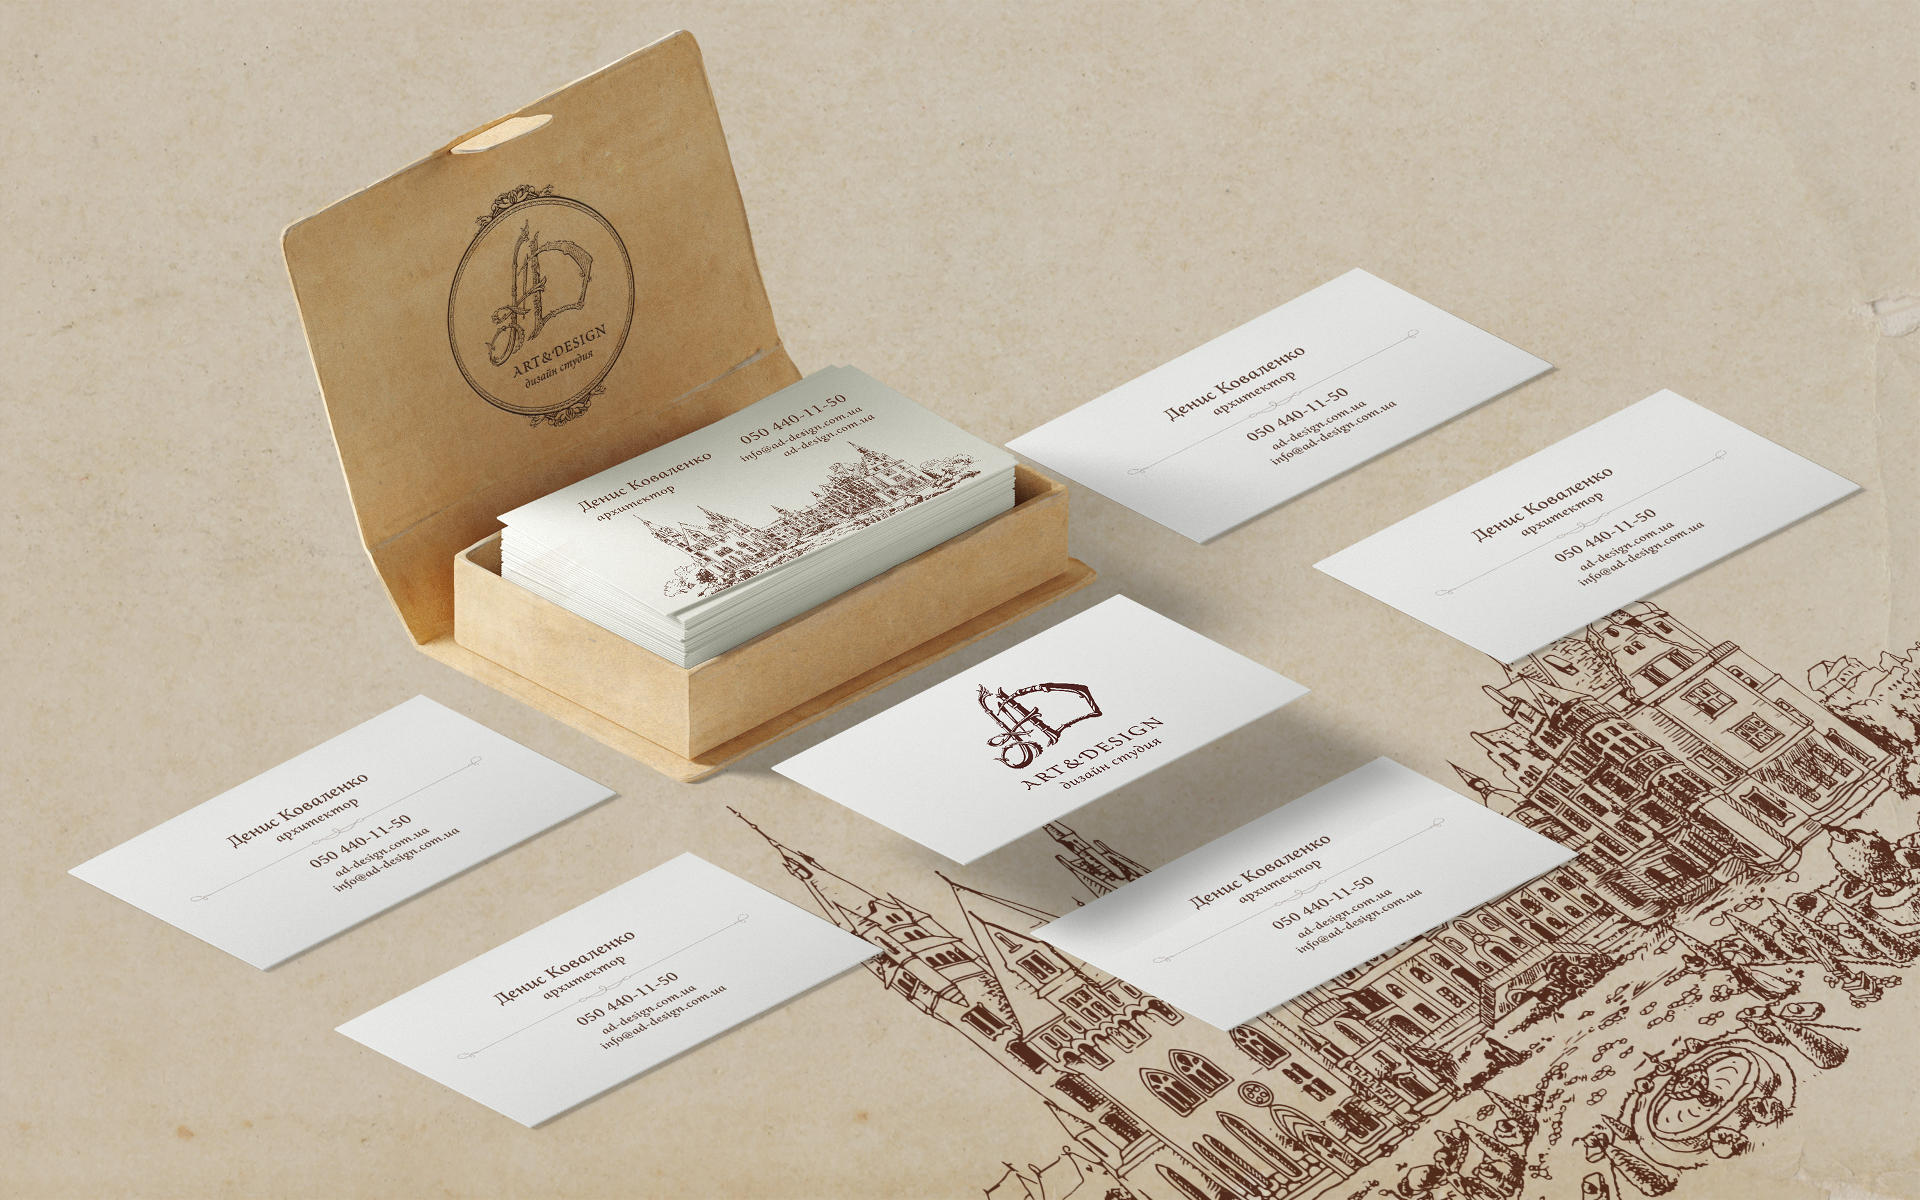 Разработка of the corporate identity для архитектурного бюро, Architecture bureau corporate identity